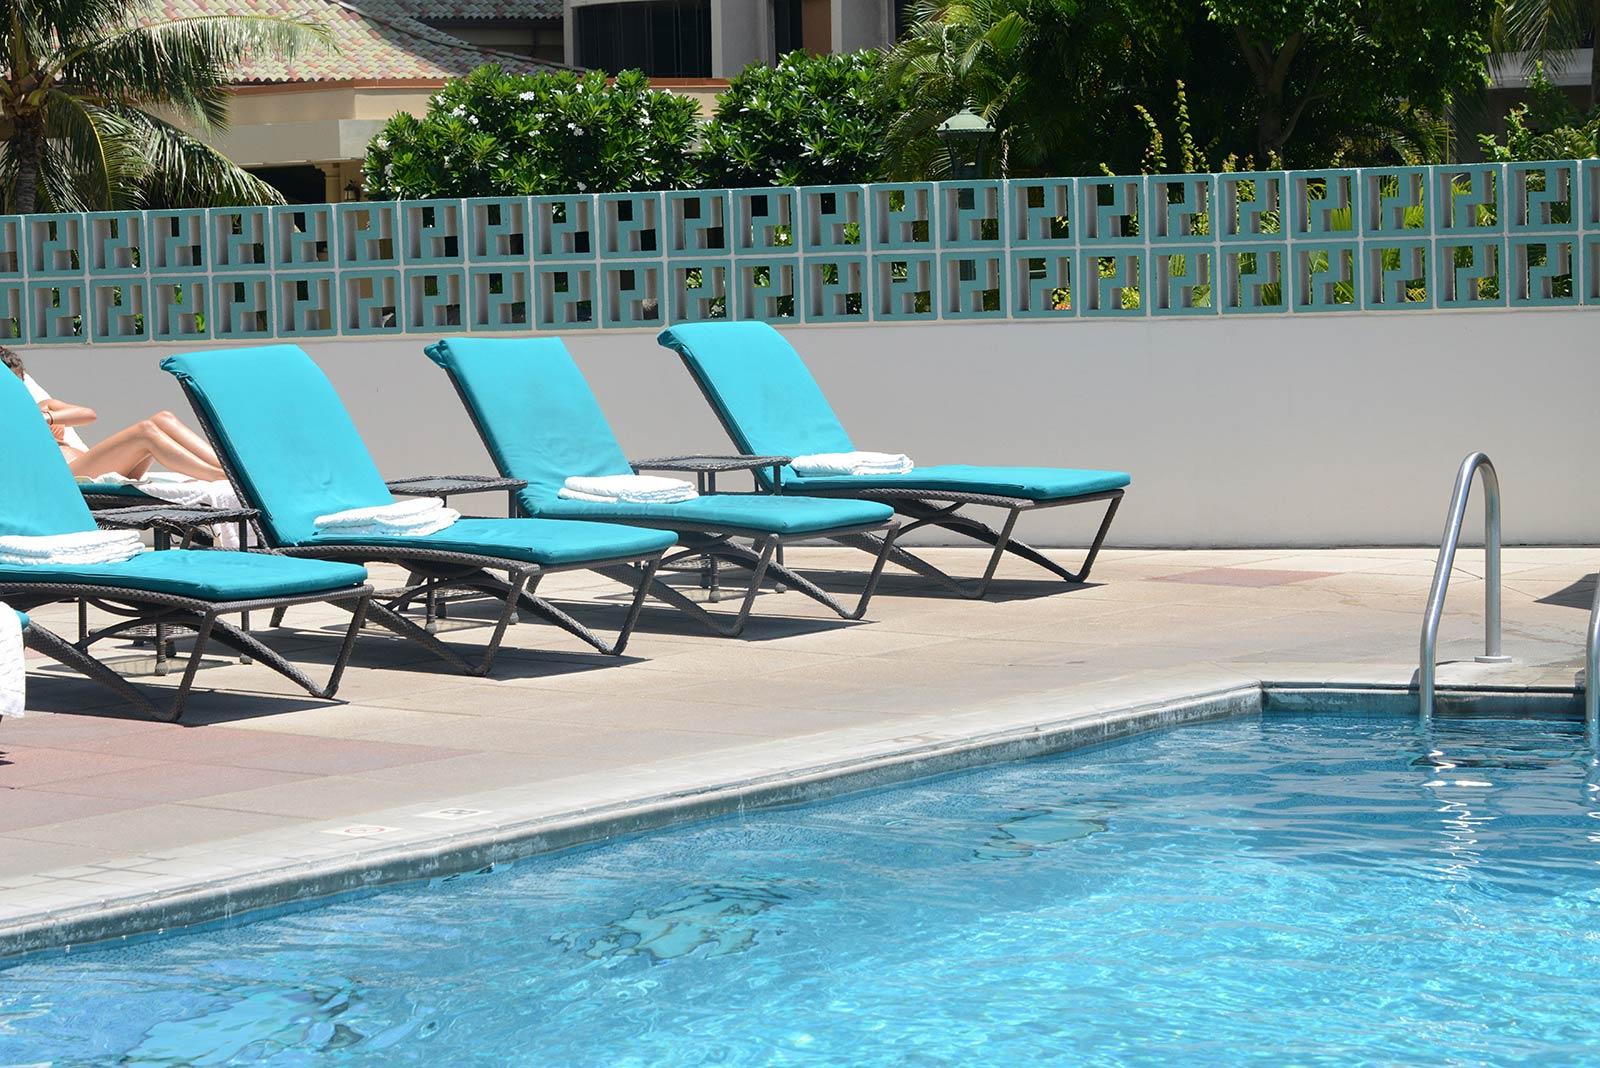 shell-vacations-hawaii-shell-owners-club-hawaii-4